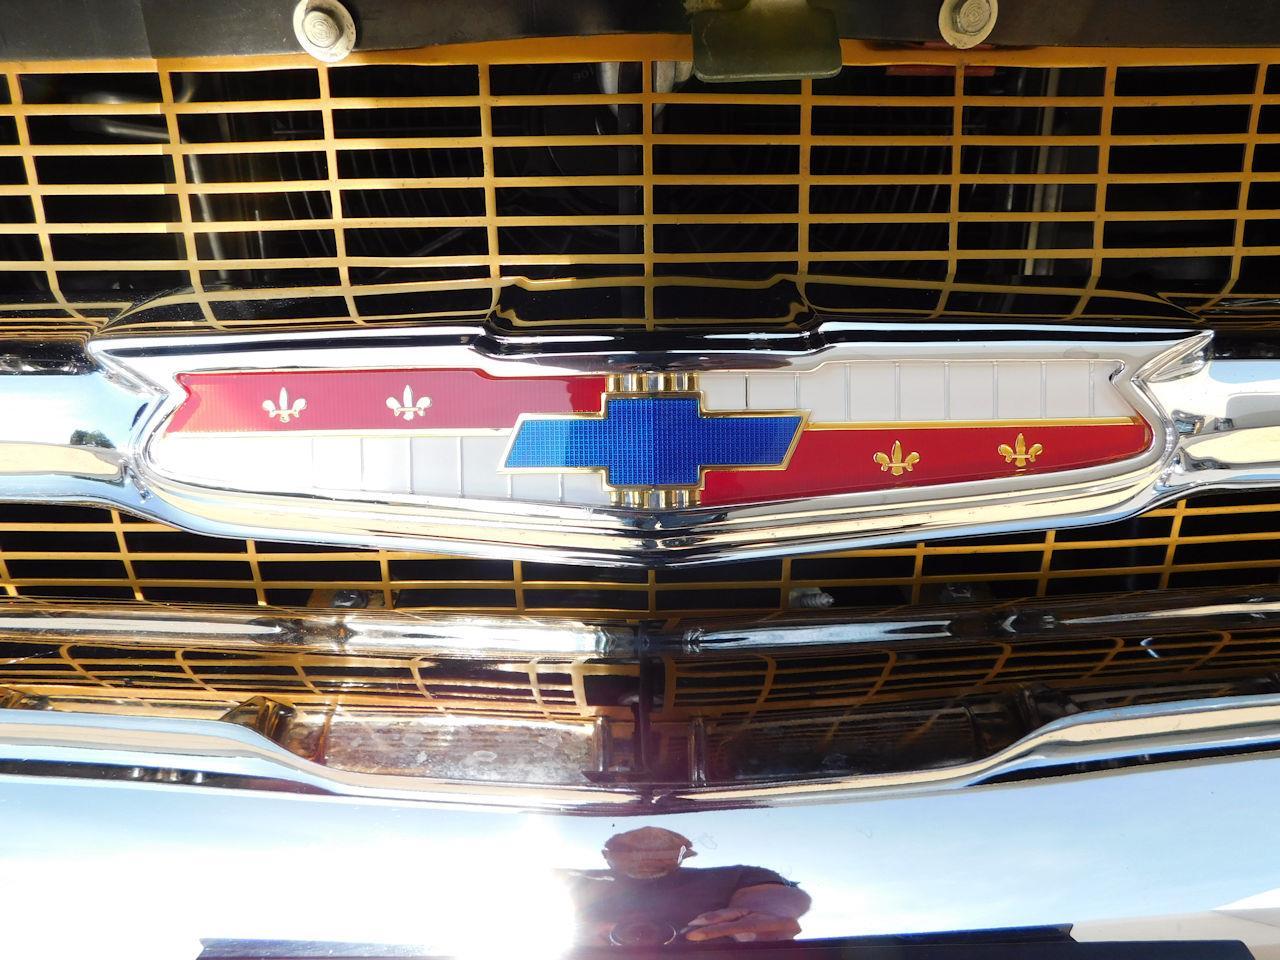 1957 Chevrolet Bel Air (CC-1379732) for sale in O'Fallon, Illinois